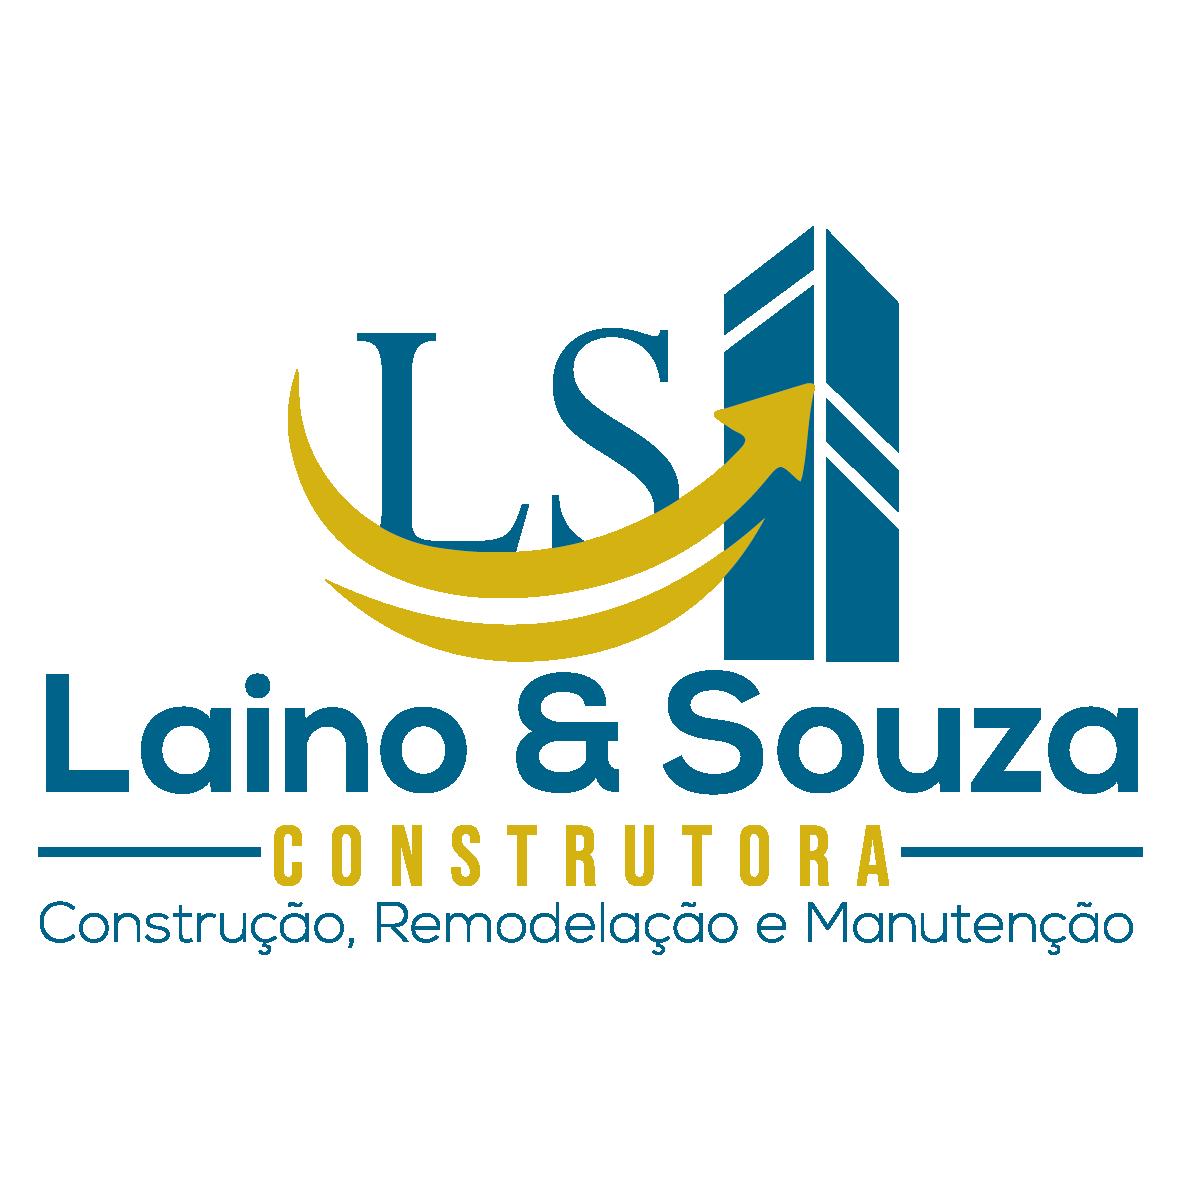 Construtora Laino & Souza